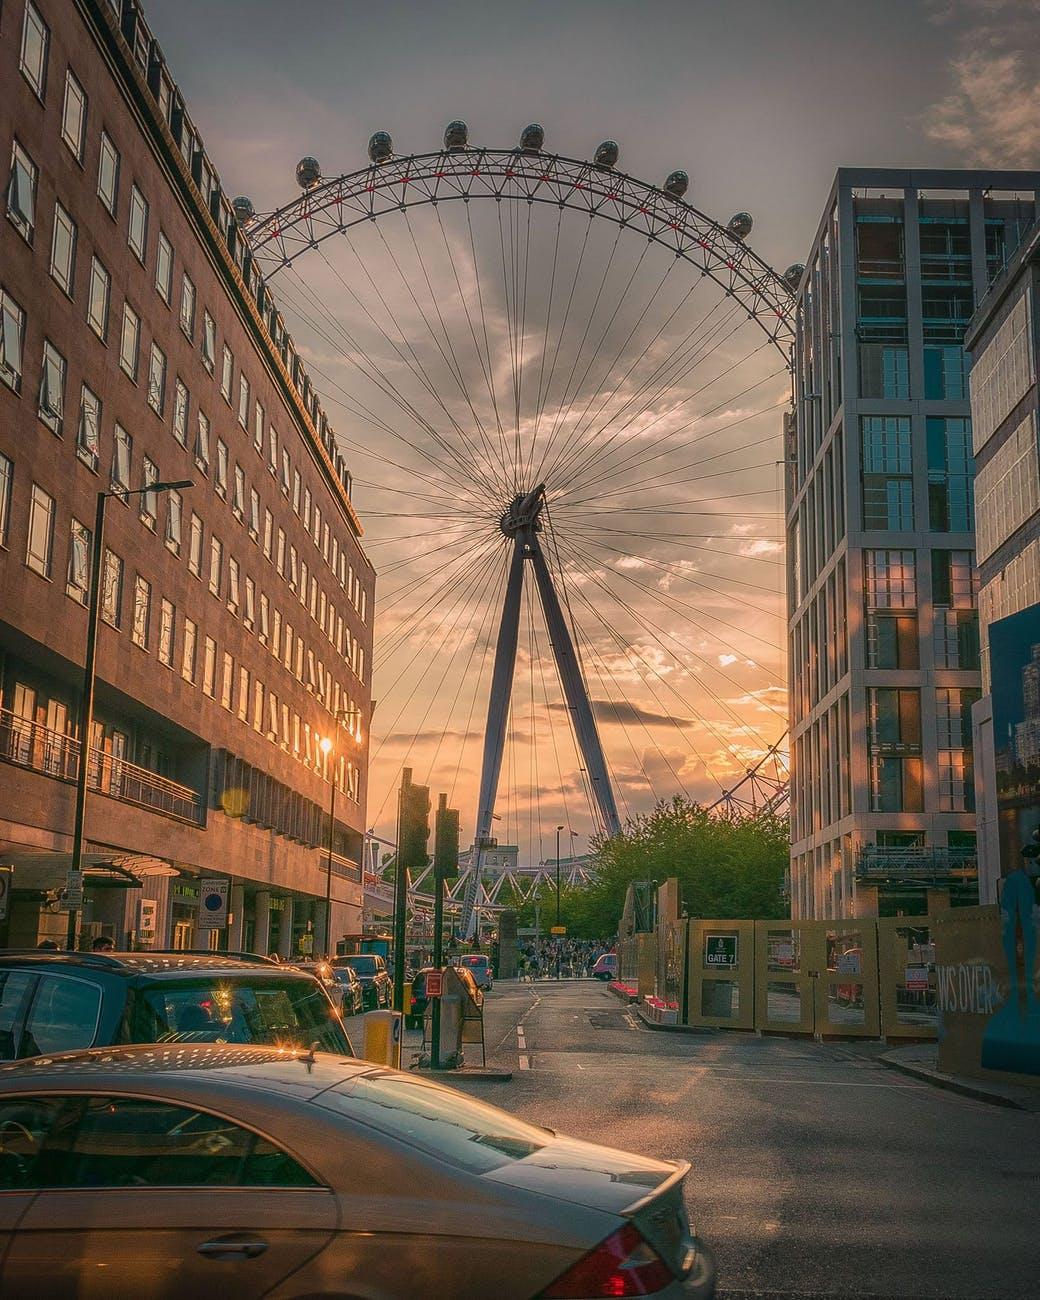 ferris wheel near building during sunset